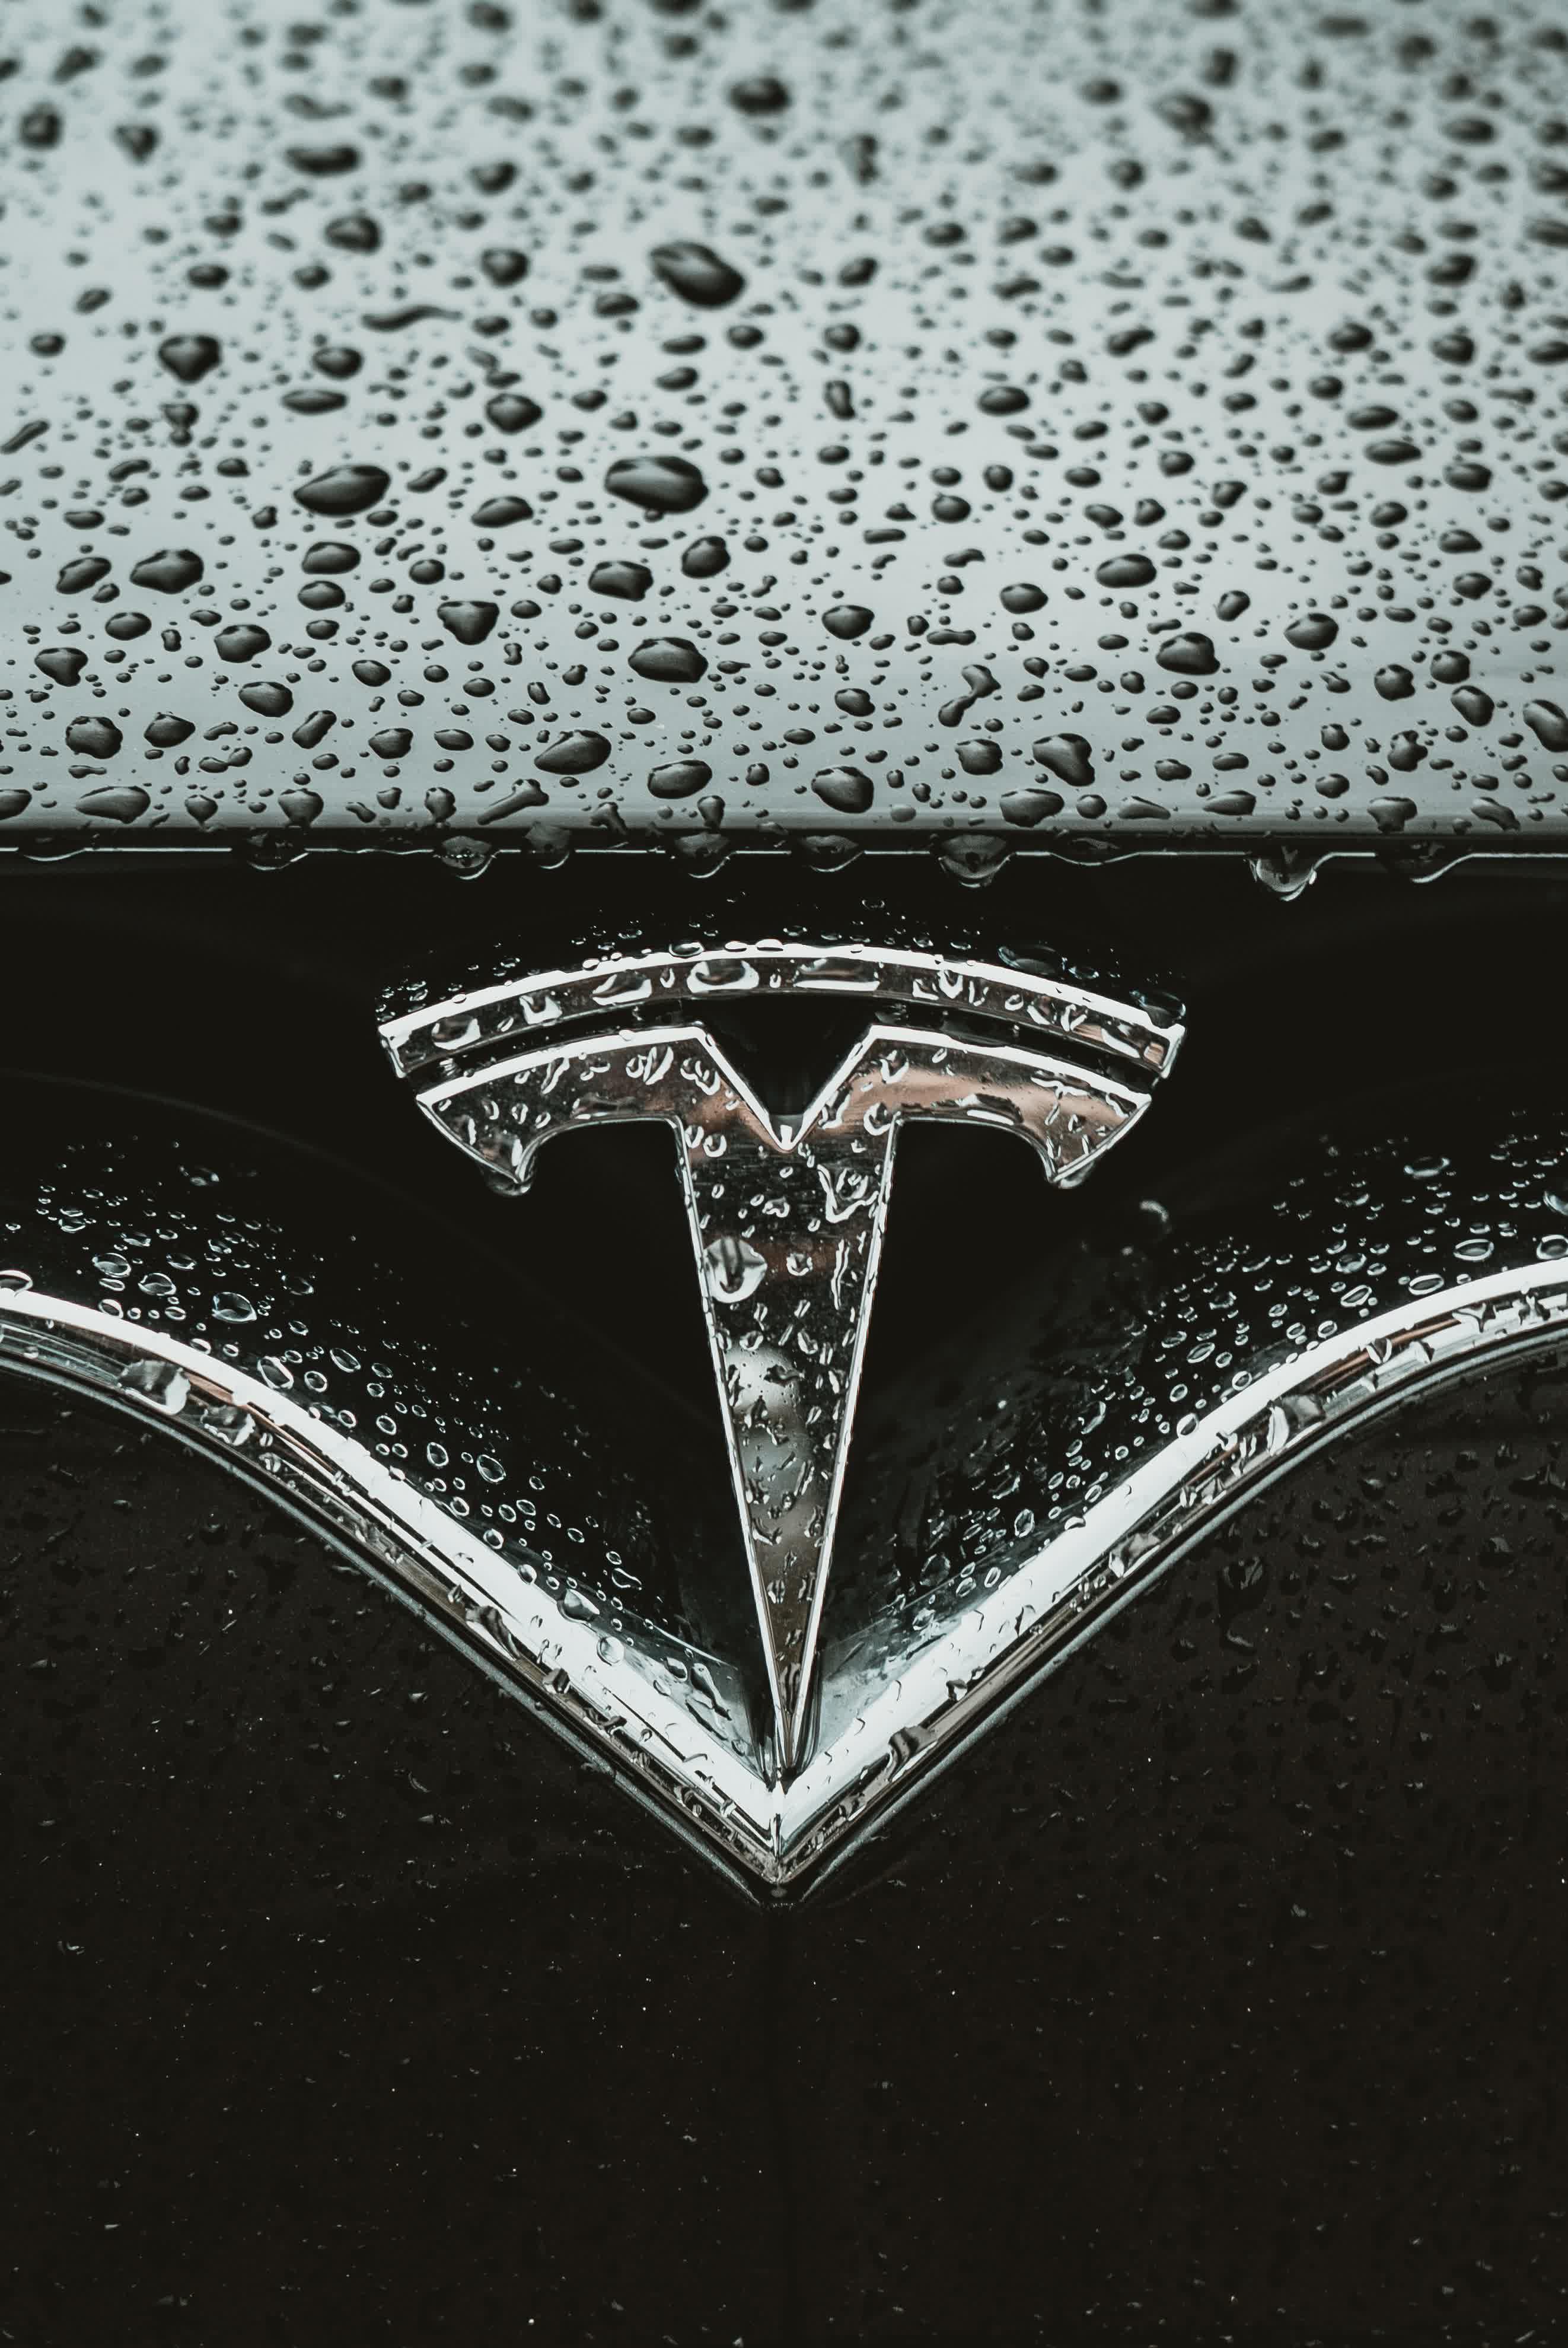 Think Of Tesla Stock As The Hermes Birkin Handbag For Today's Equity Market - Tesla, Inc. (NASDAQ:TSLA) | Seeking Alpha